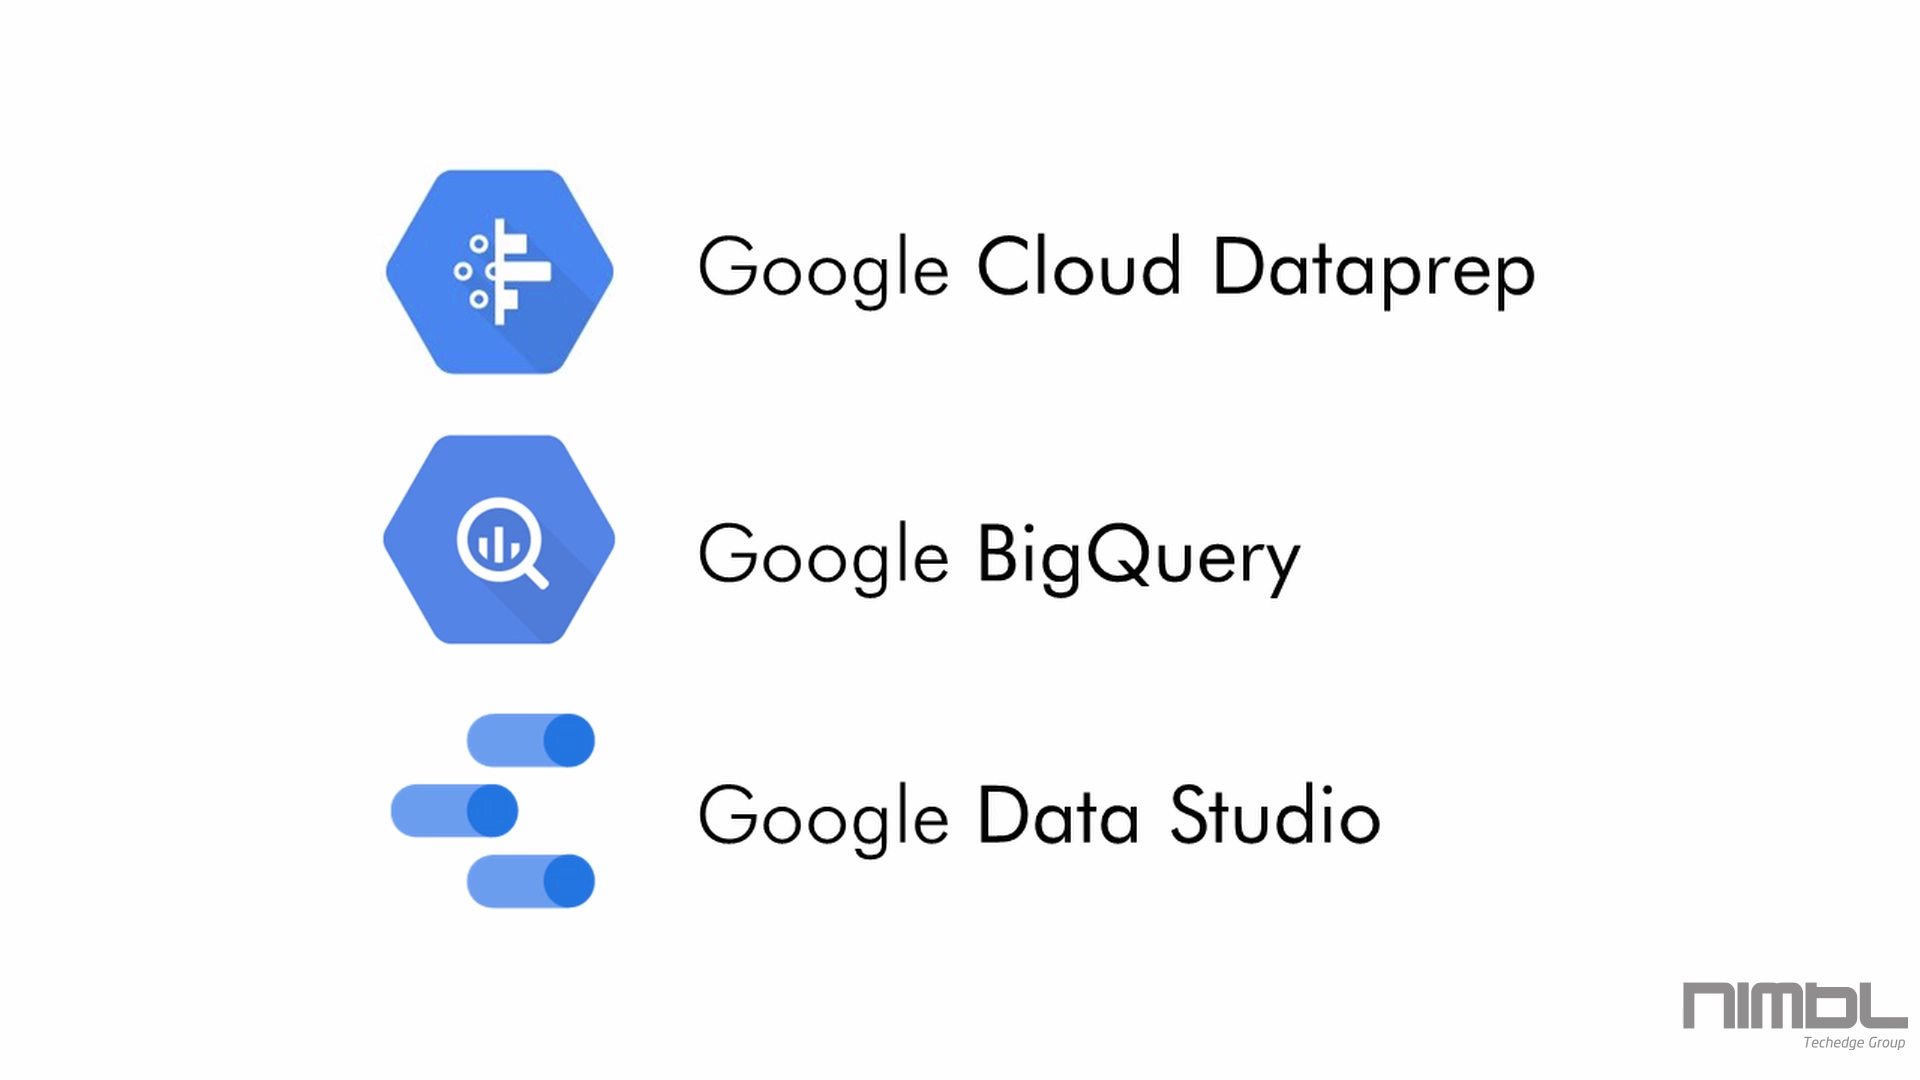 US NIMBL | Google | Accelerate Your Data Analytics With GCP